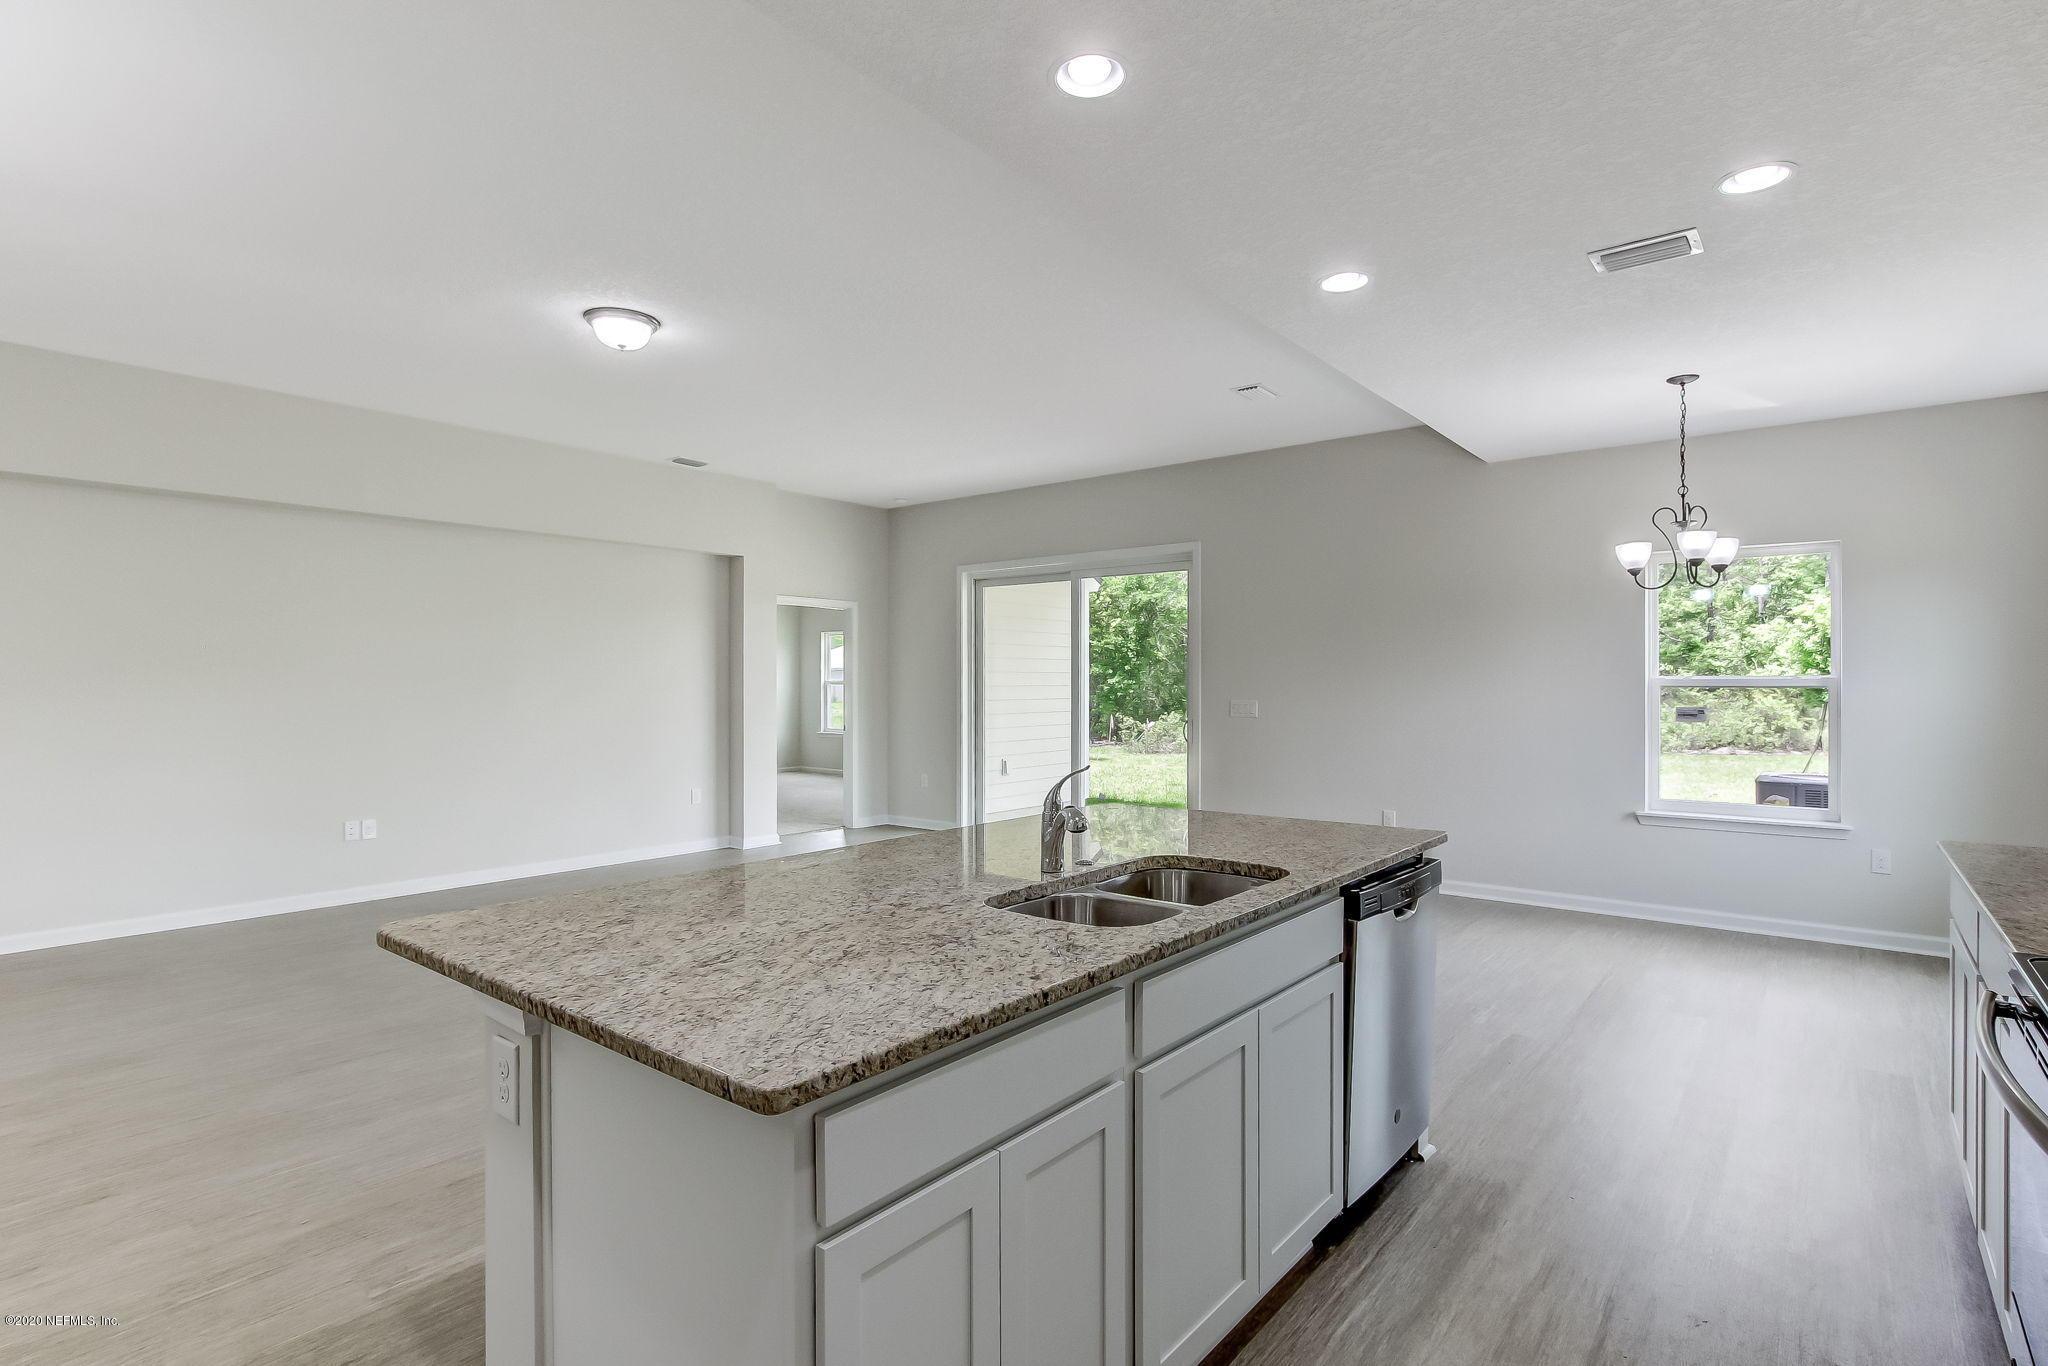 1727 AUSTIN LAKE, MIDDLEBURG, FLORIDA 32068, 4 Bedrooms Bedrooms, ,2 BathroomsBathrooms,Residential,For sale,AUSTIN LAKE,1033584